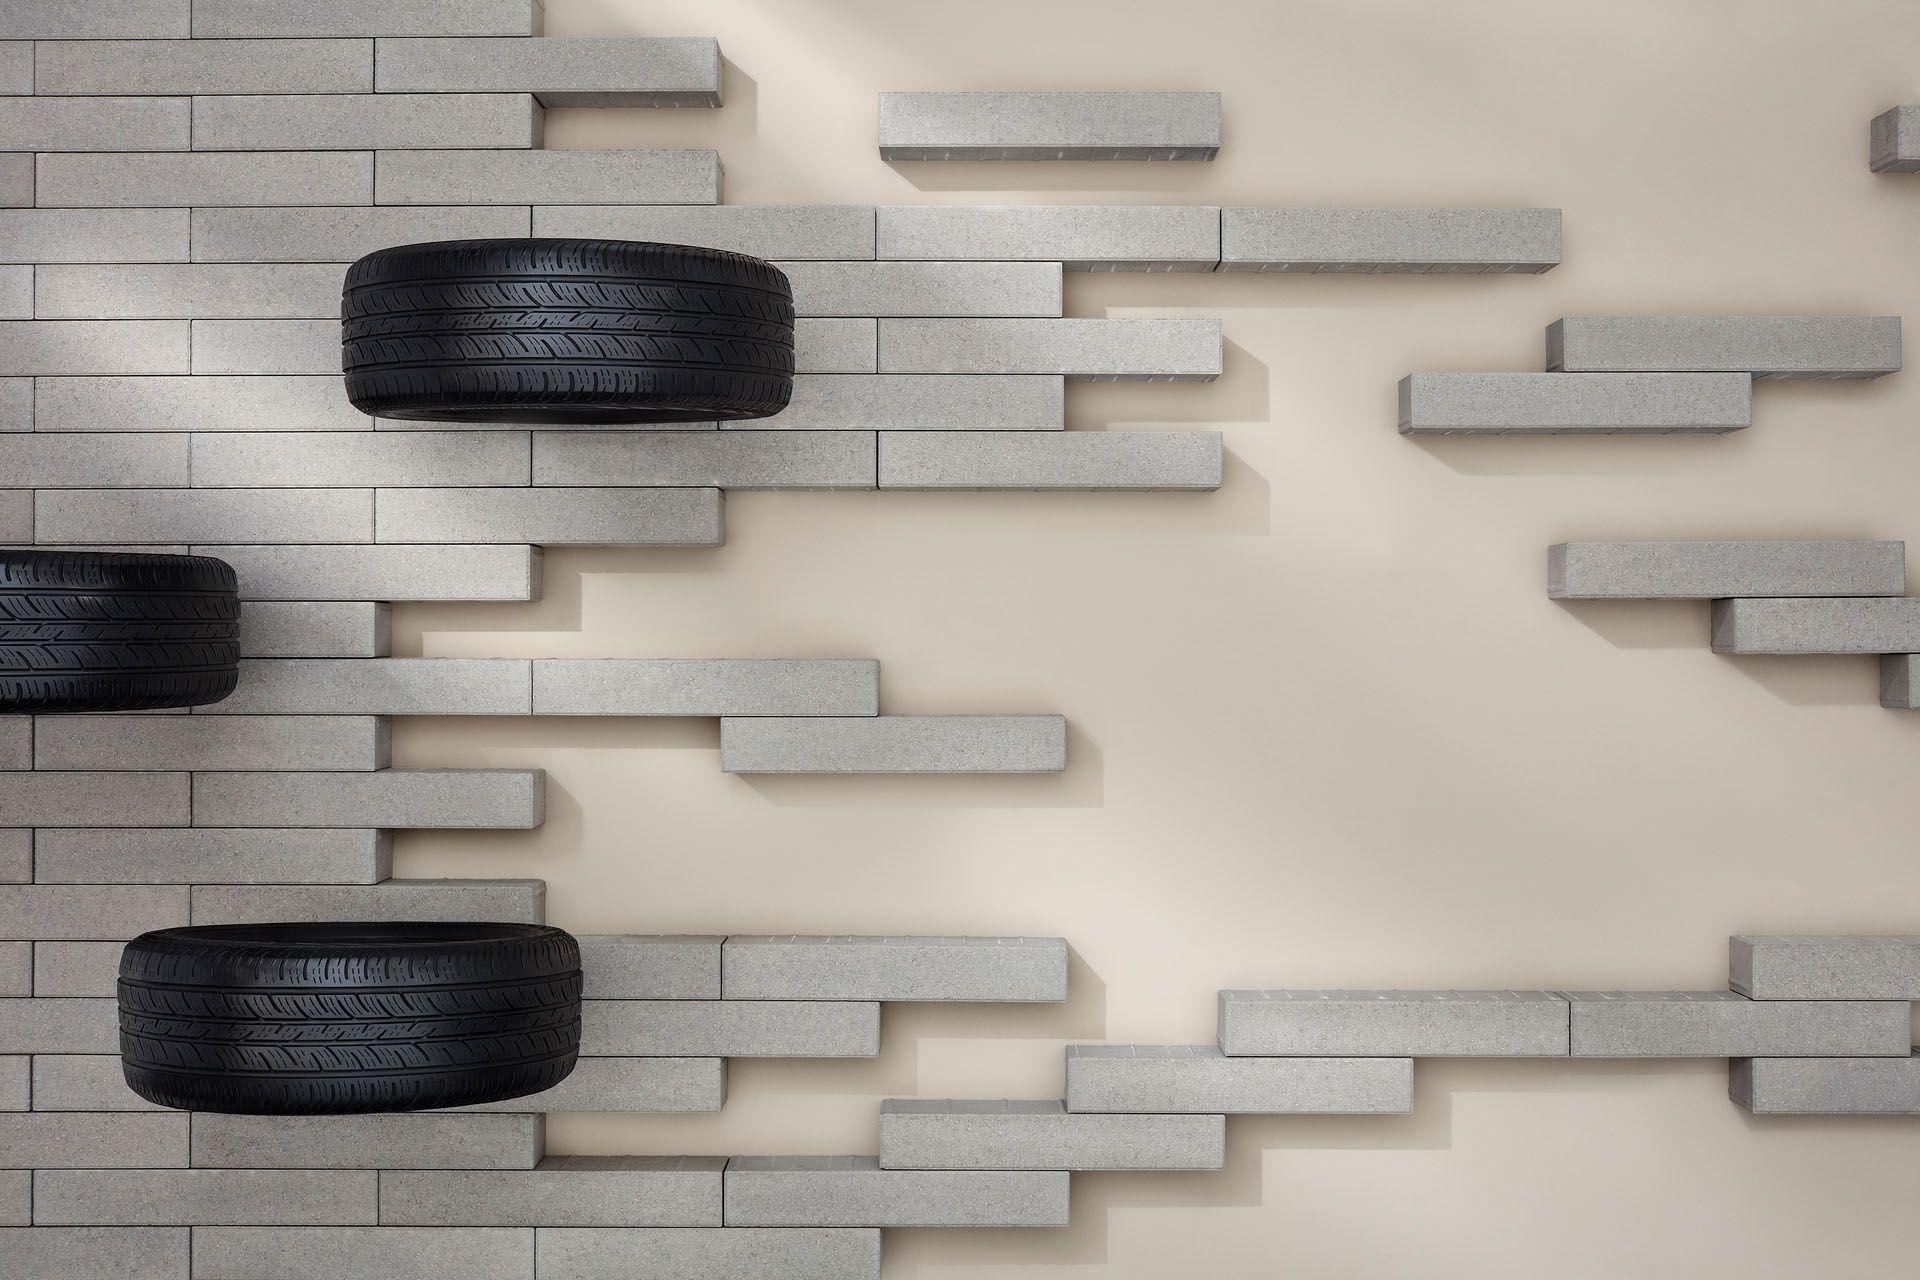 concrete tiles with tires by Mathieu Levesque for Techo Bloc